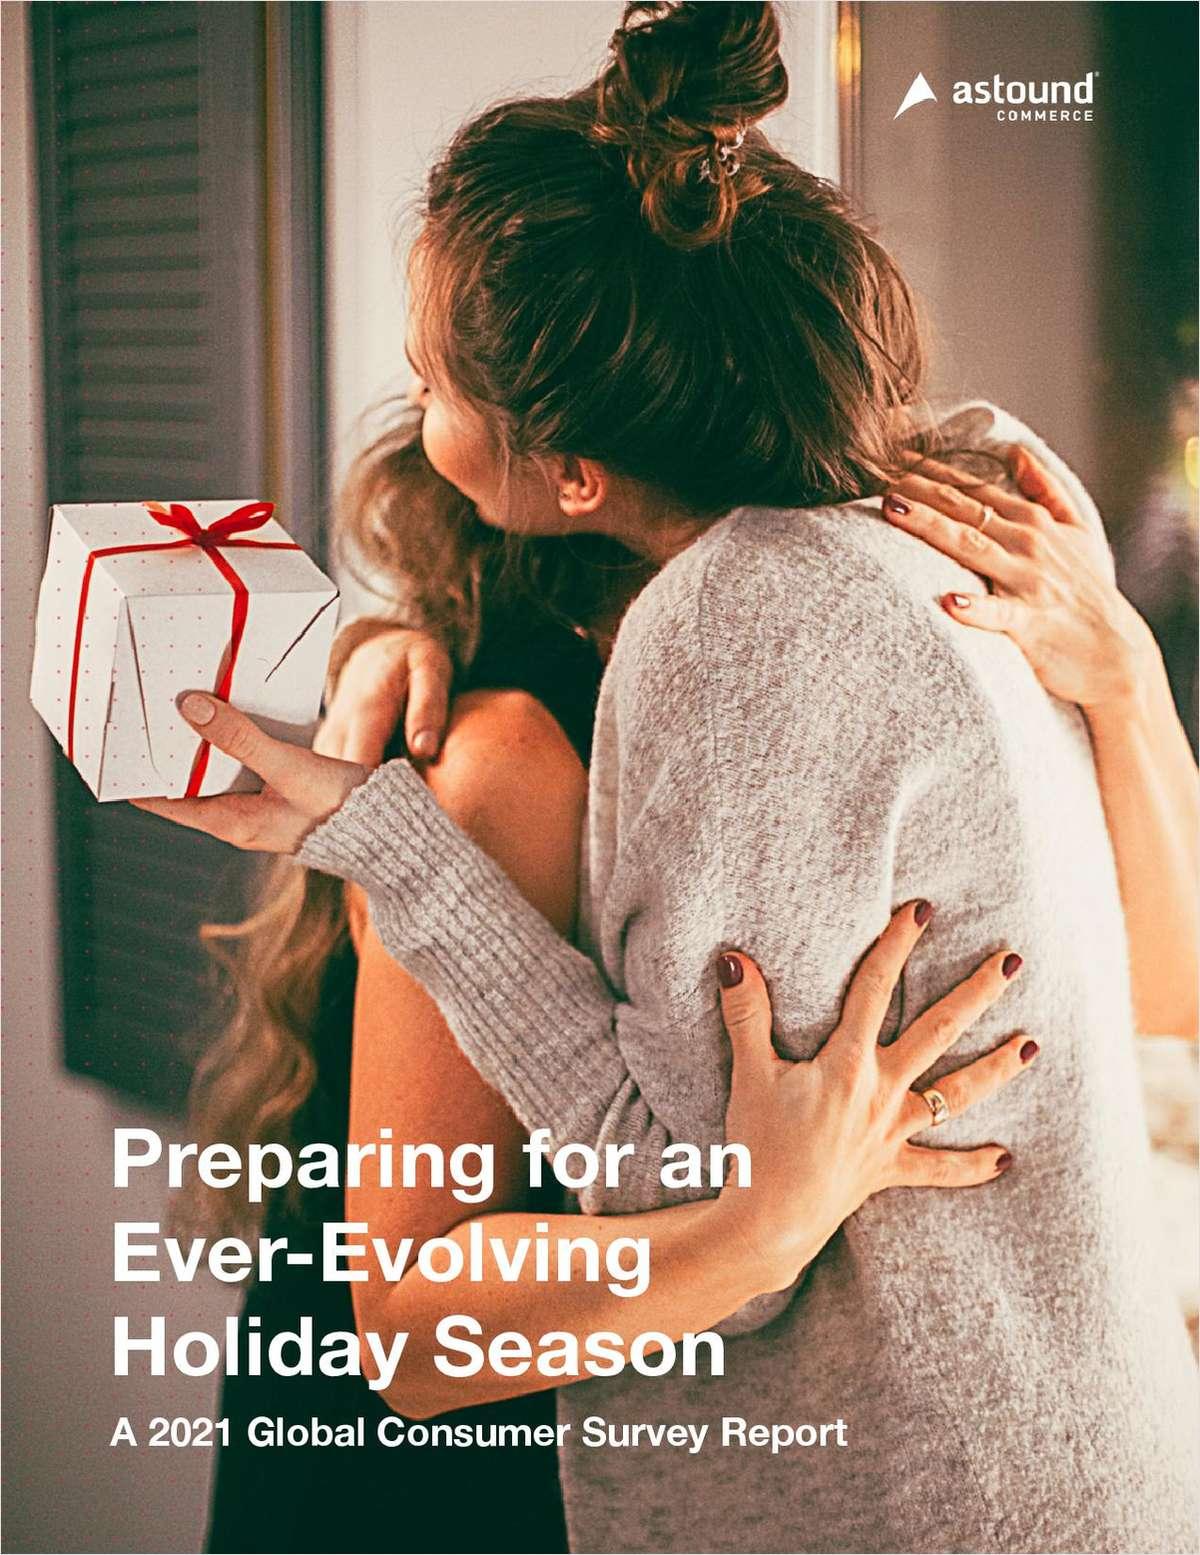 Preparing for the Ever-Evolving Holiday Season